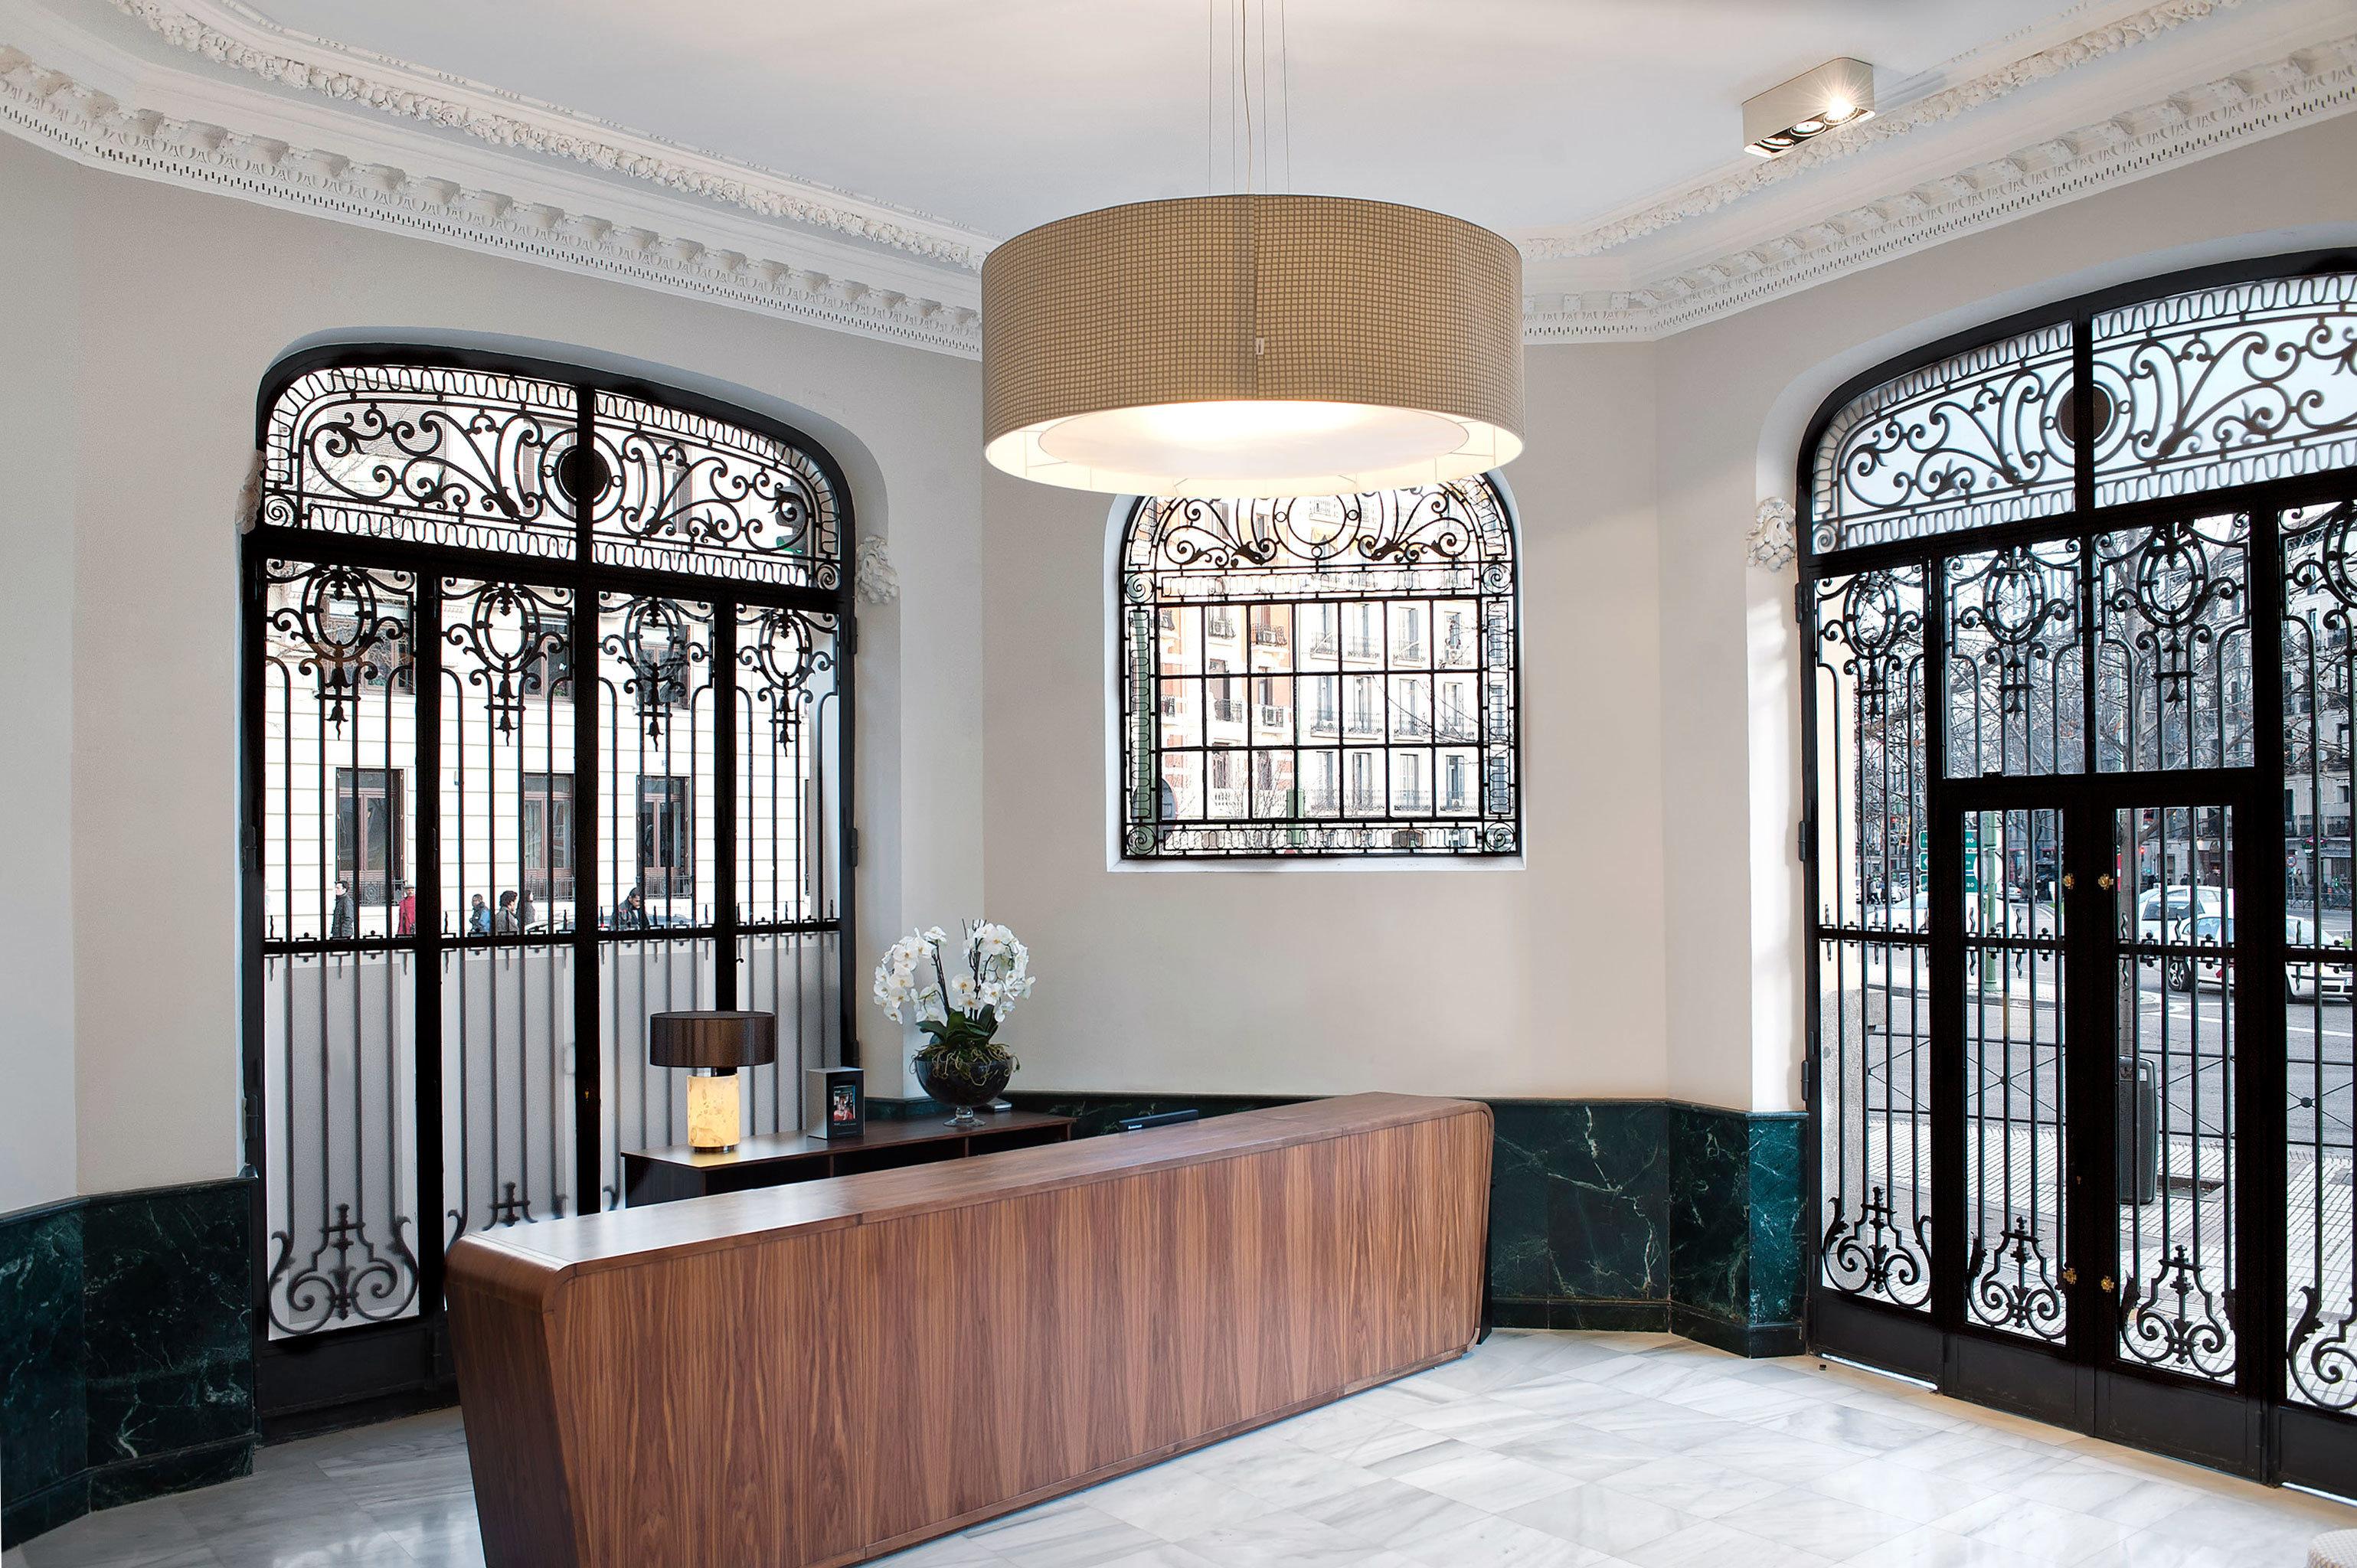 Boutique City Hip Lounge Modern property home lighting living room cabinetry hall mansion tub tiled